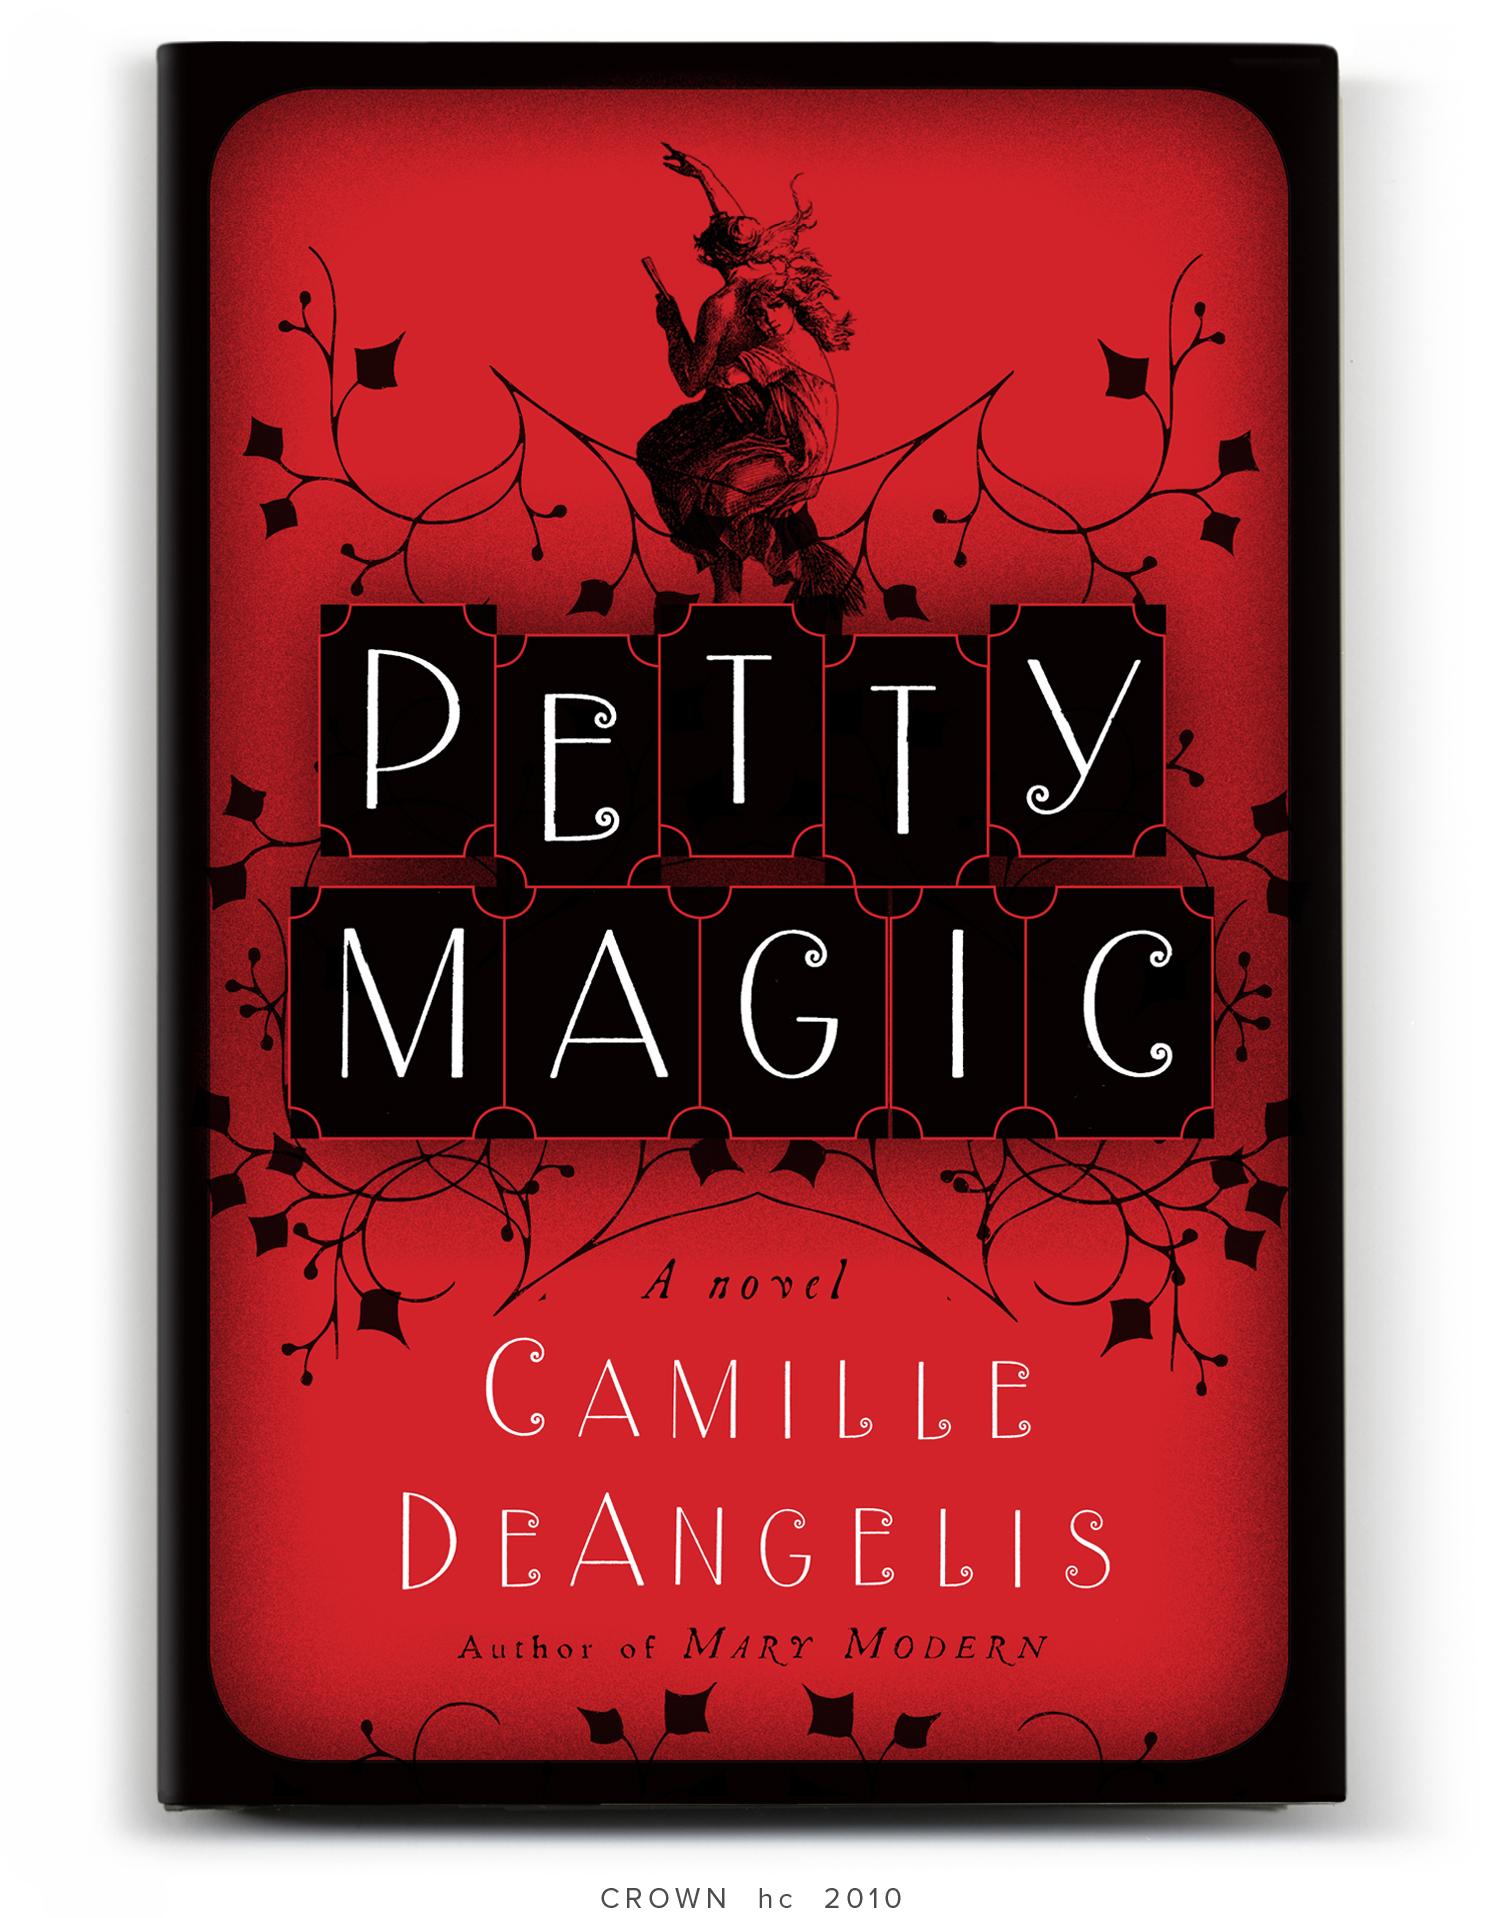 PETTY-MAGIC-hc-ss6.jpg